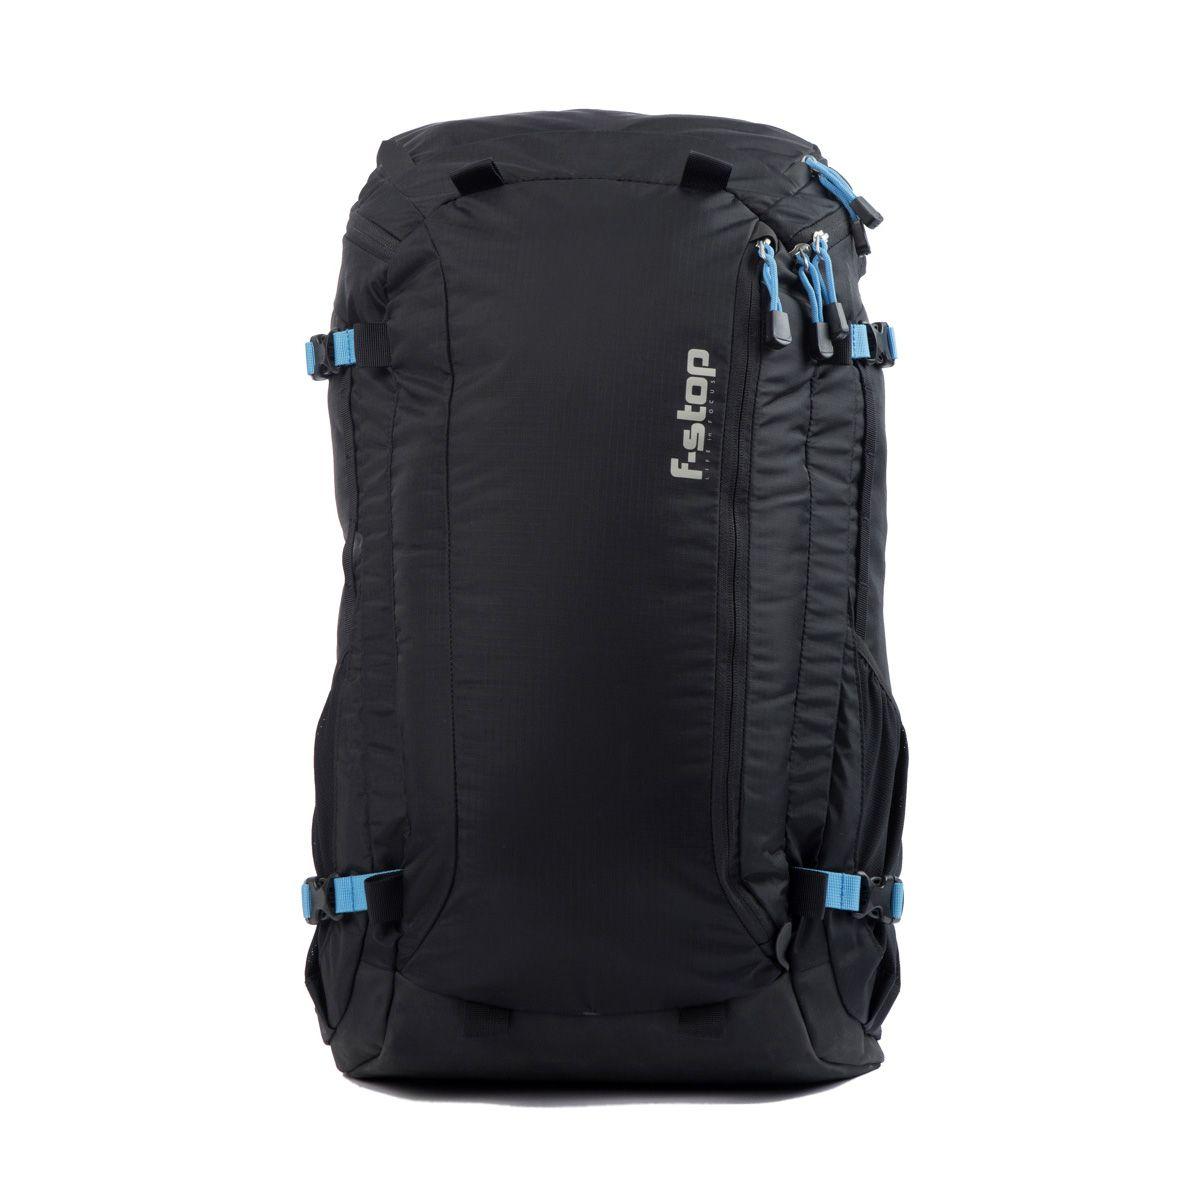 Loka UL    f-stop   Camera backpack. Big camera